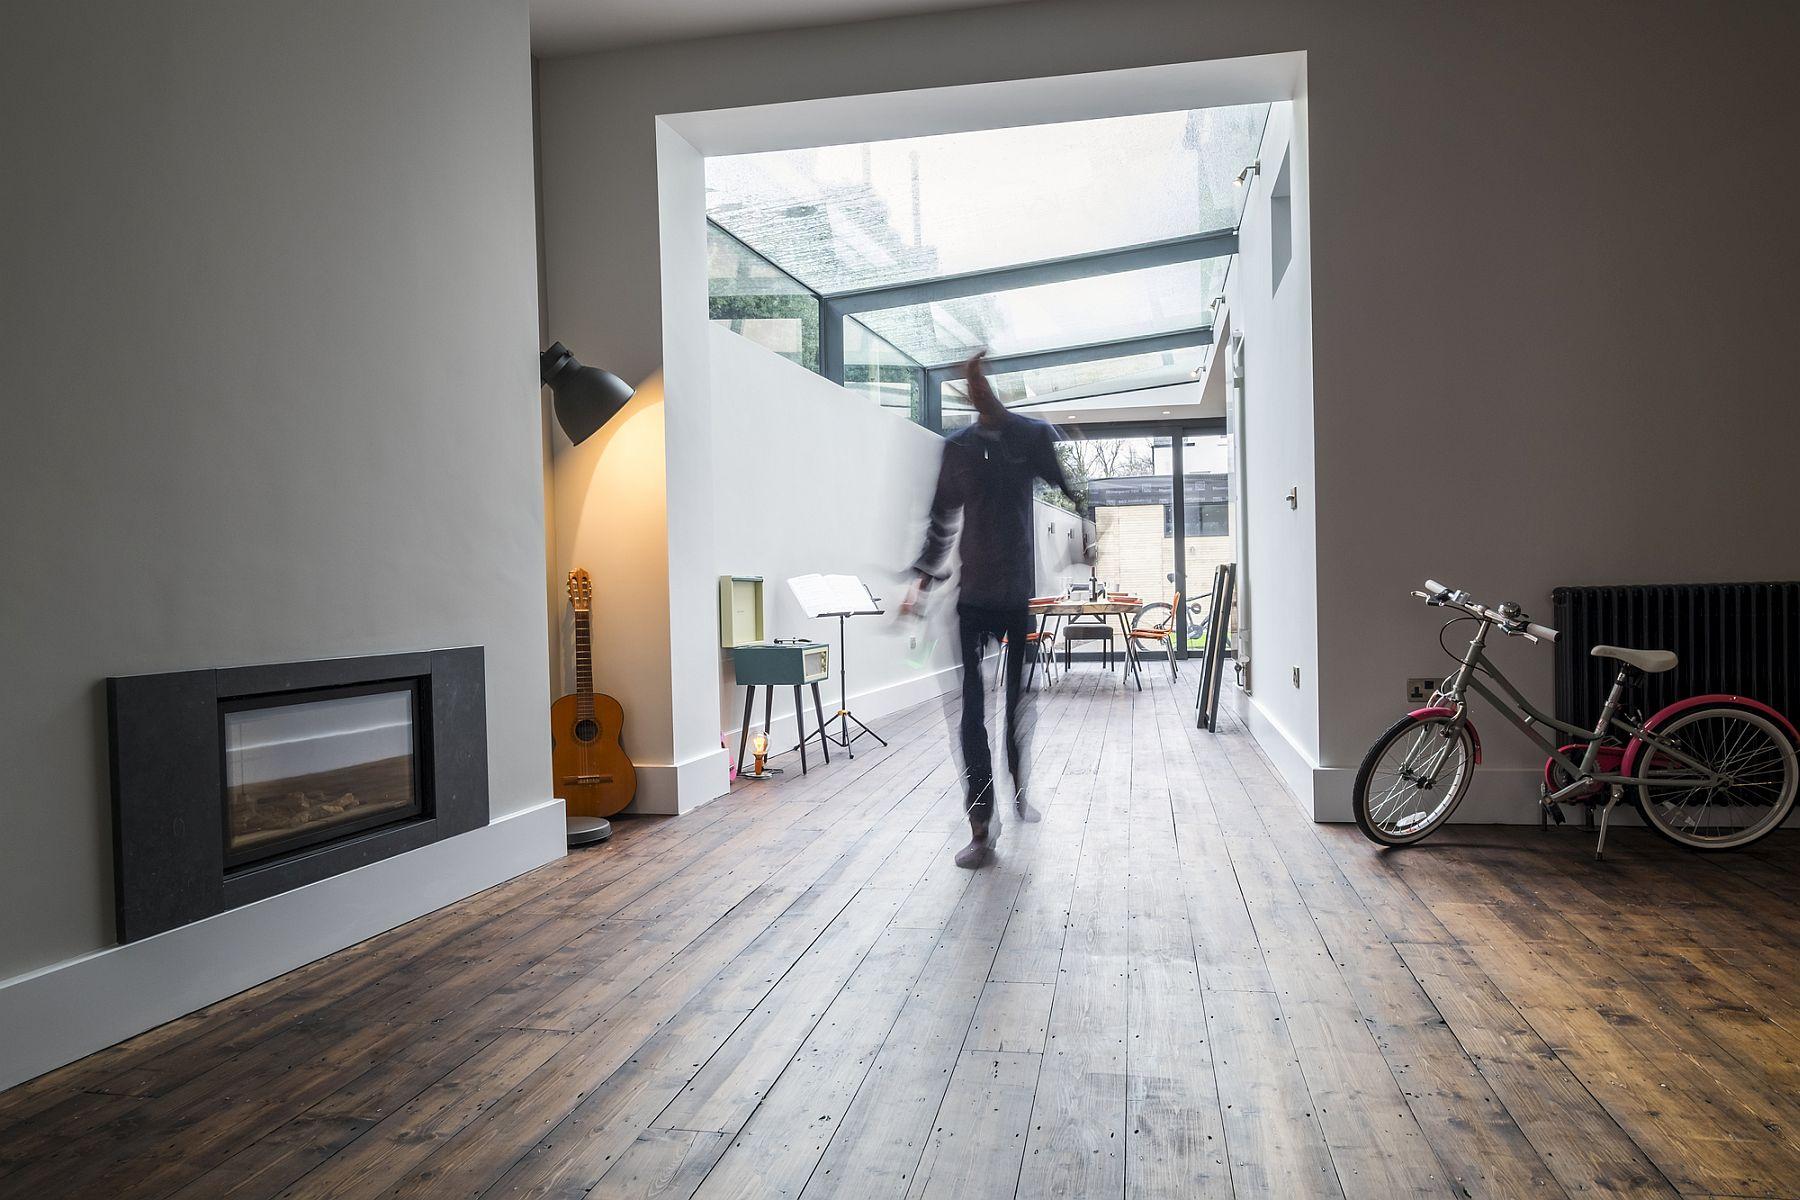 Modern Revamp Involving a Glass Roof Transforms This Dark